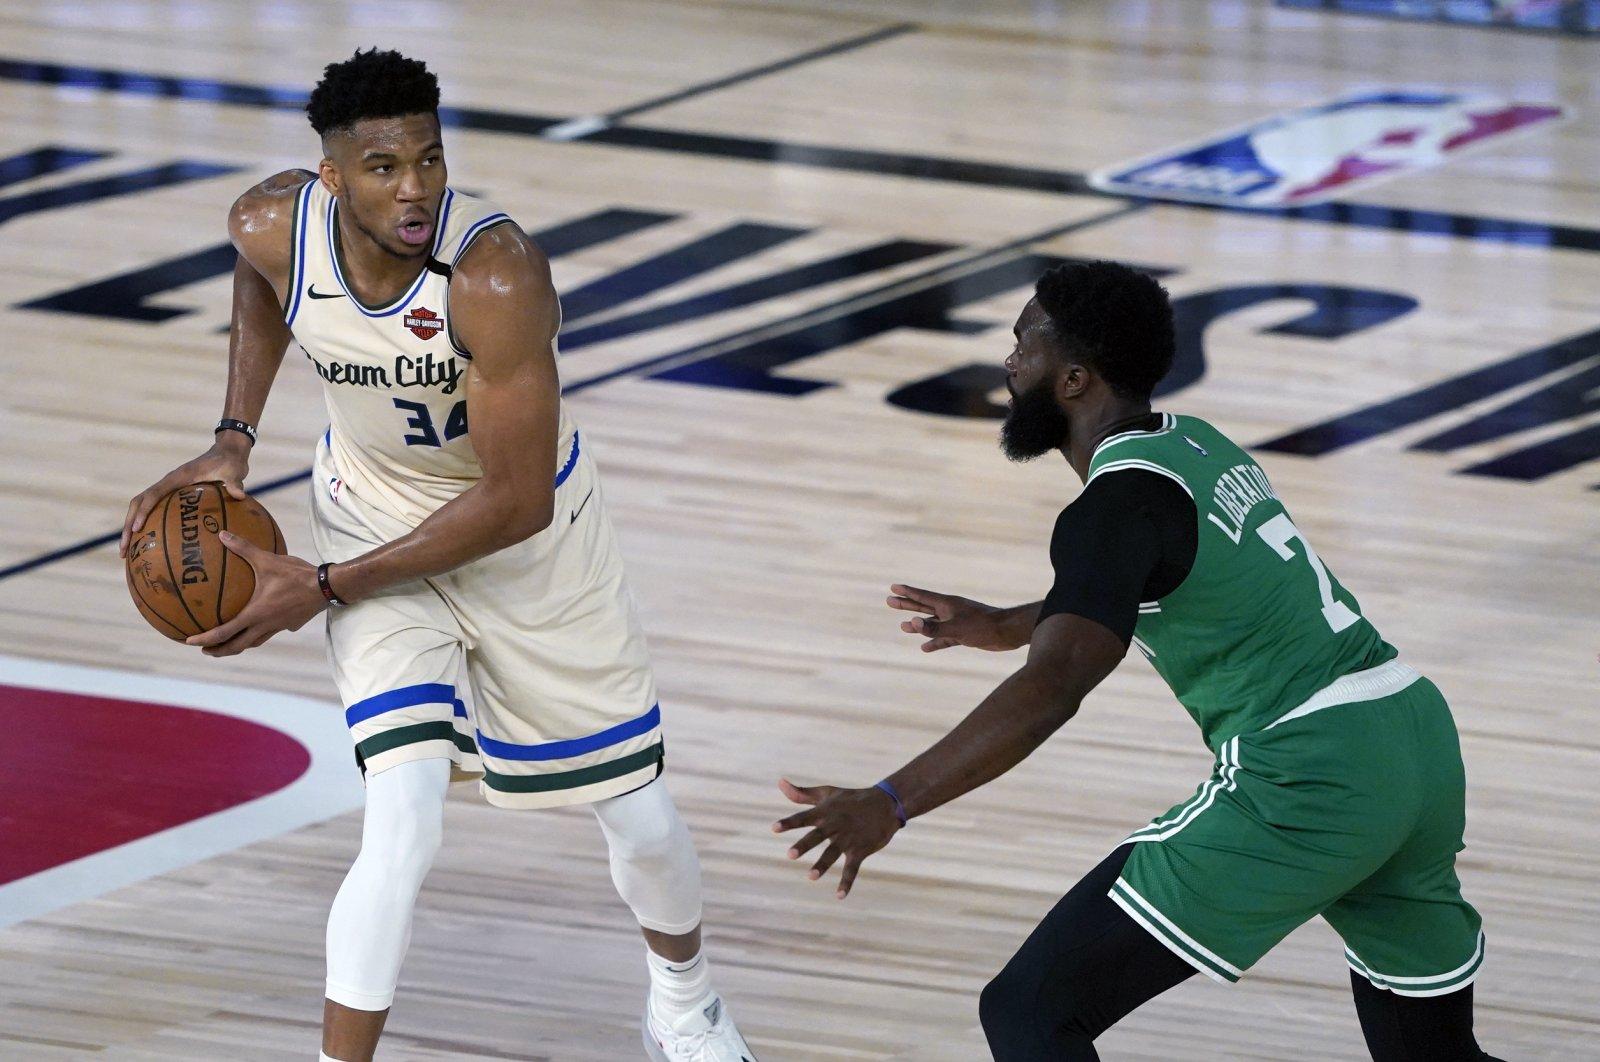 The Milwaukee Bucks' Giannis Antetokounmpo (L) looks to pass around the Boston Celtics' Jaylen Brown (R) during the first half of an NBA basketball game in Lake Buena Vista, Florida, July 31, 2020. (Ashley Landis/Pool Photo via USA Today Sports/Reuters)